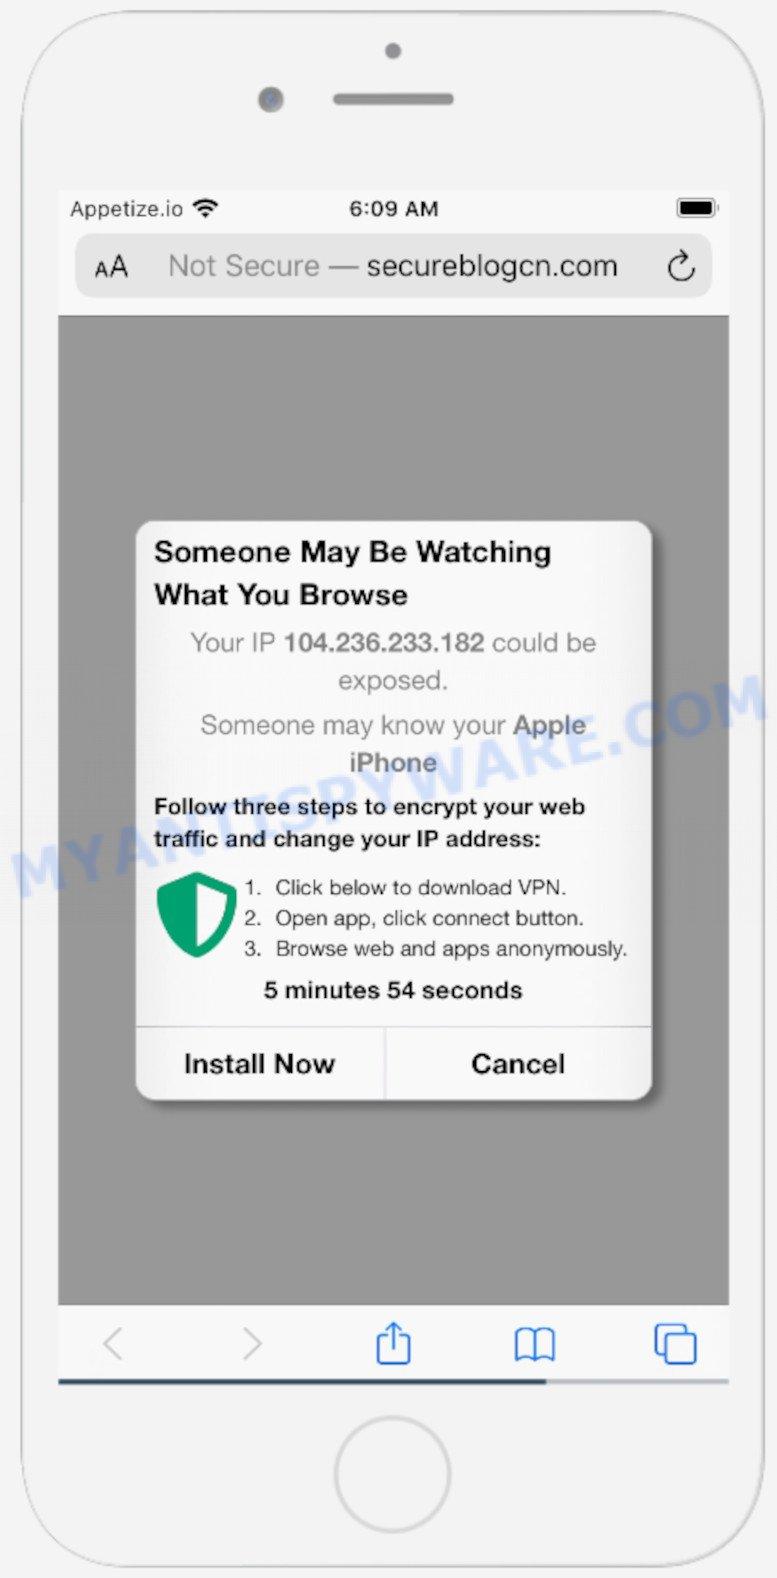 Secureblogcn.com scam